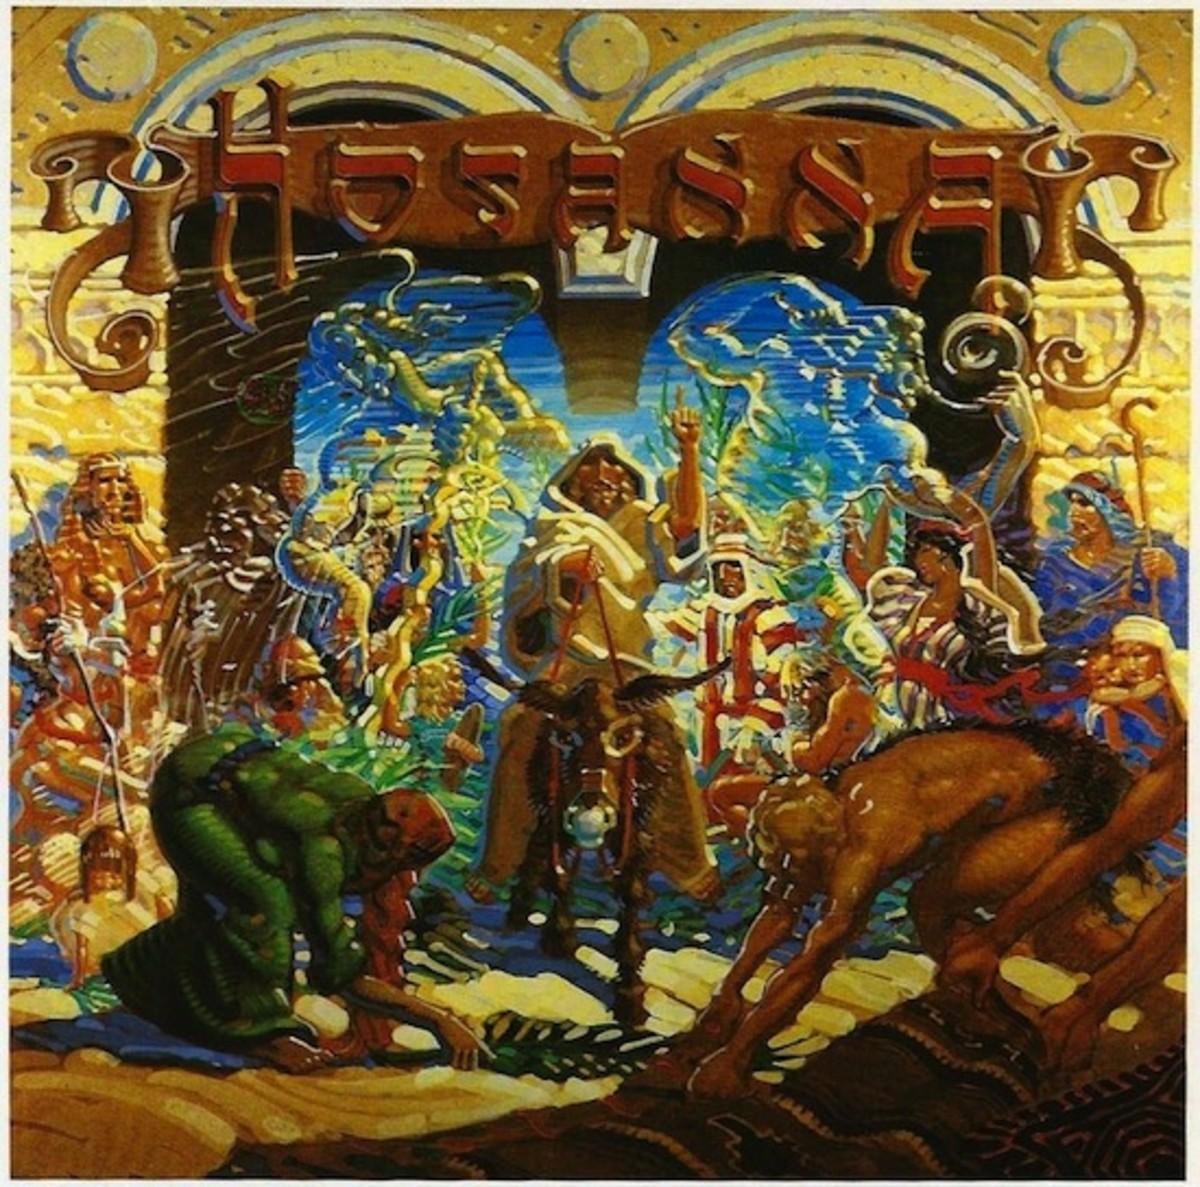 "Hosanna ""Hosanna"" Marantha Records 12"" LP Vinyl Record, US Pressing (1979) Album Cover Art Rick Griffin"